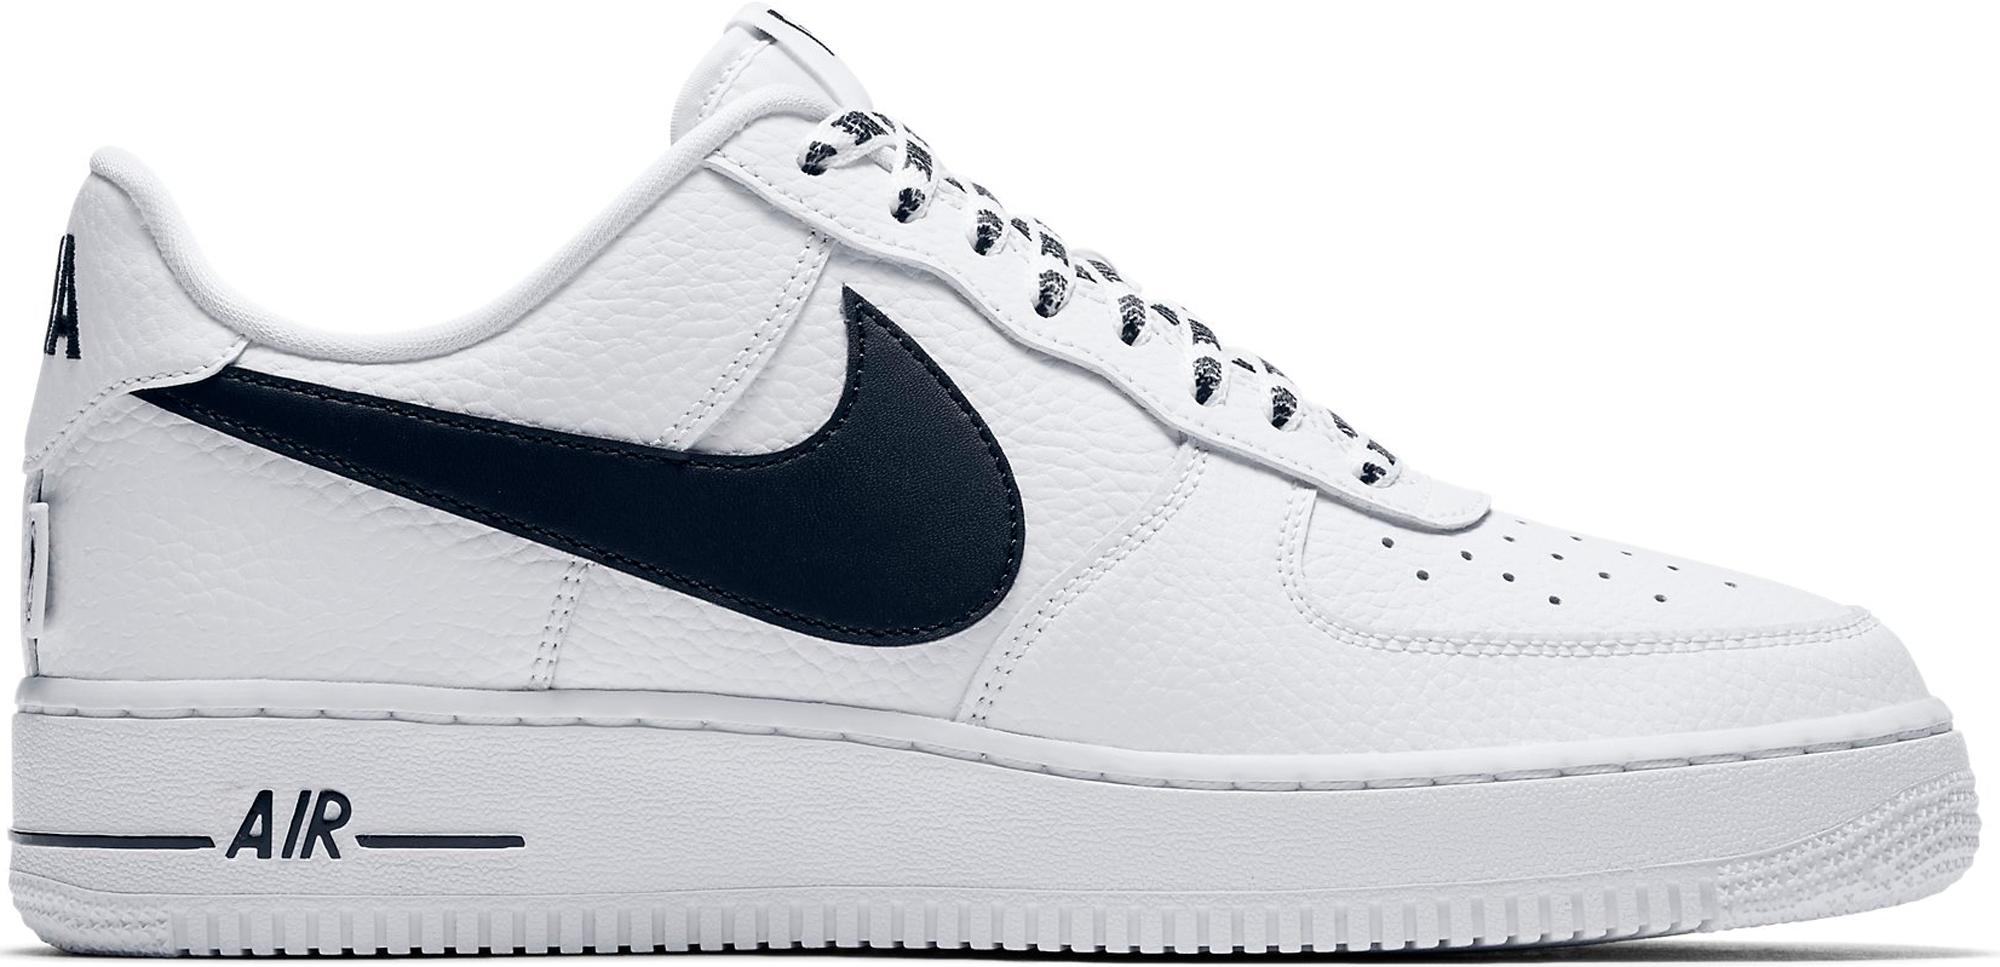 Air Force 1 Low NBA White Black